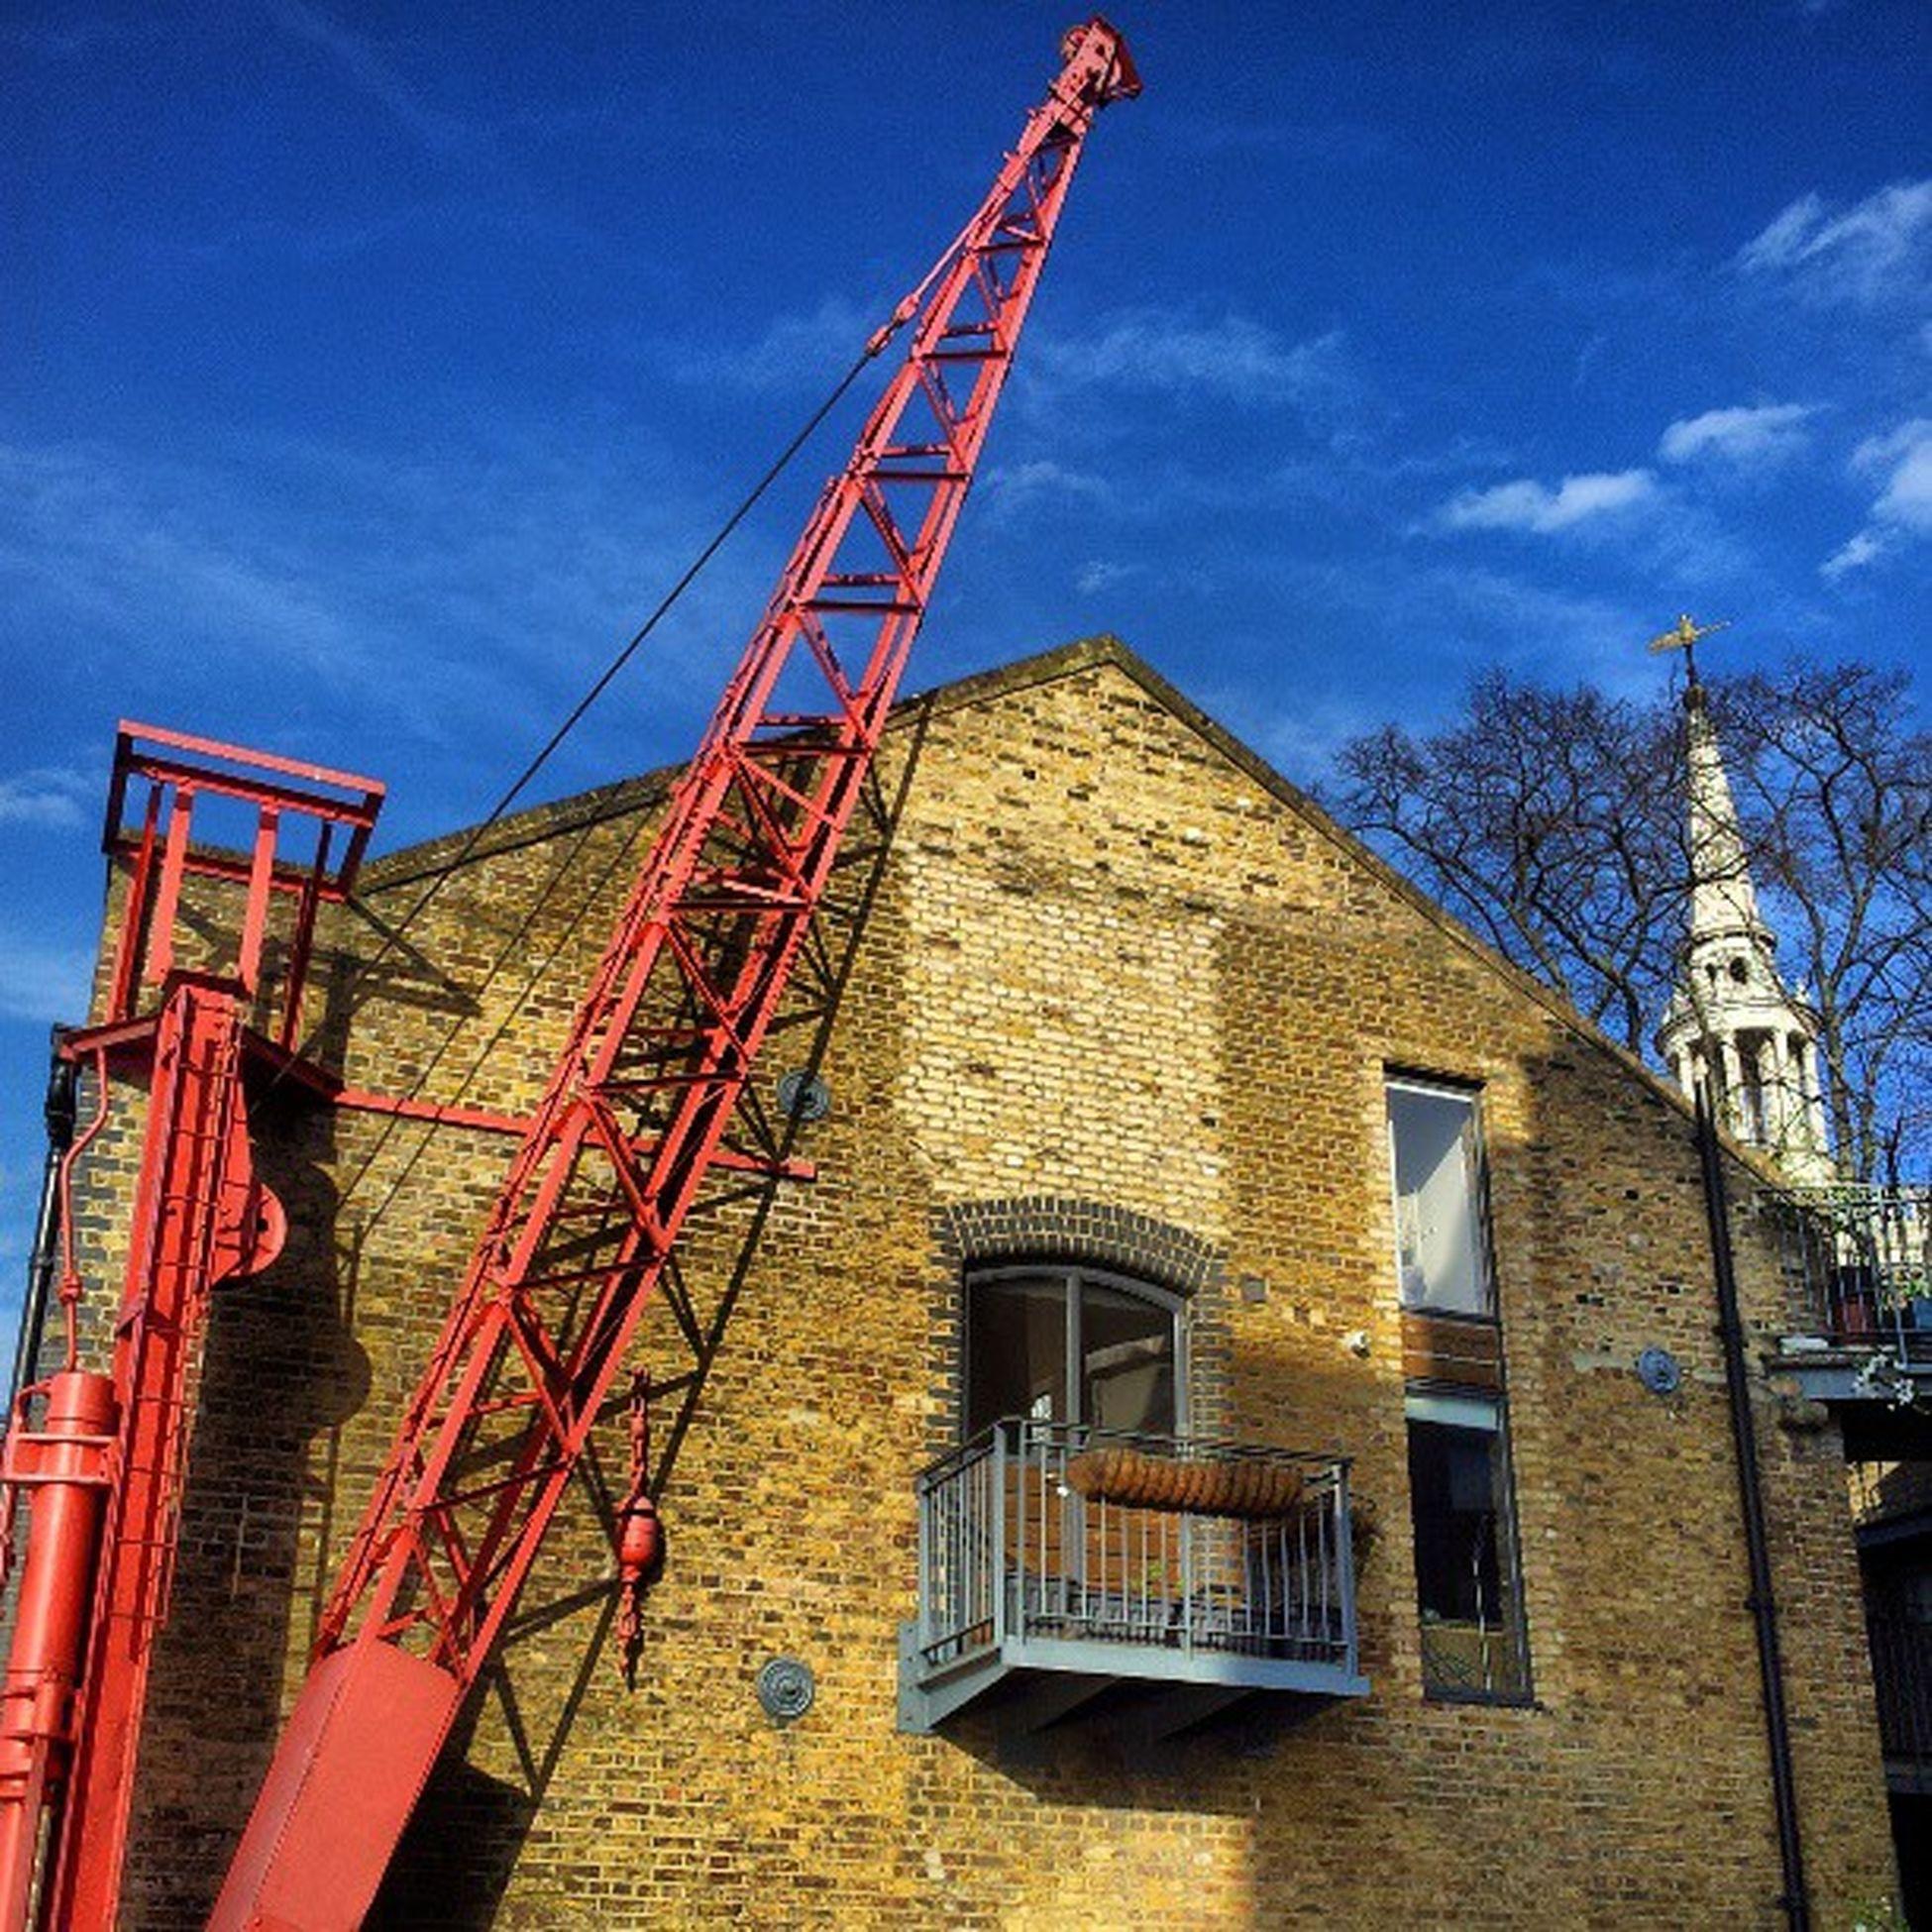 Warehouseconversion Warehouseconversions Crane Cranes craneporn docks dockside rotherhithe church selondon selondonforever